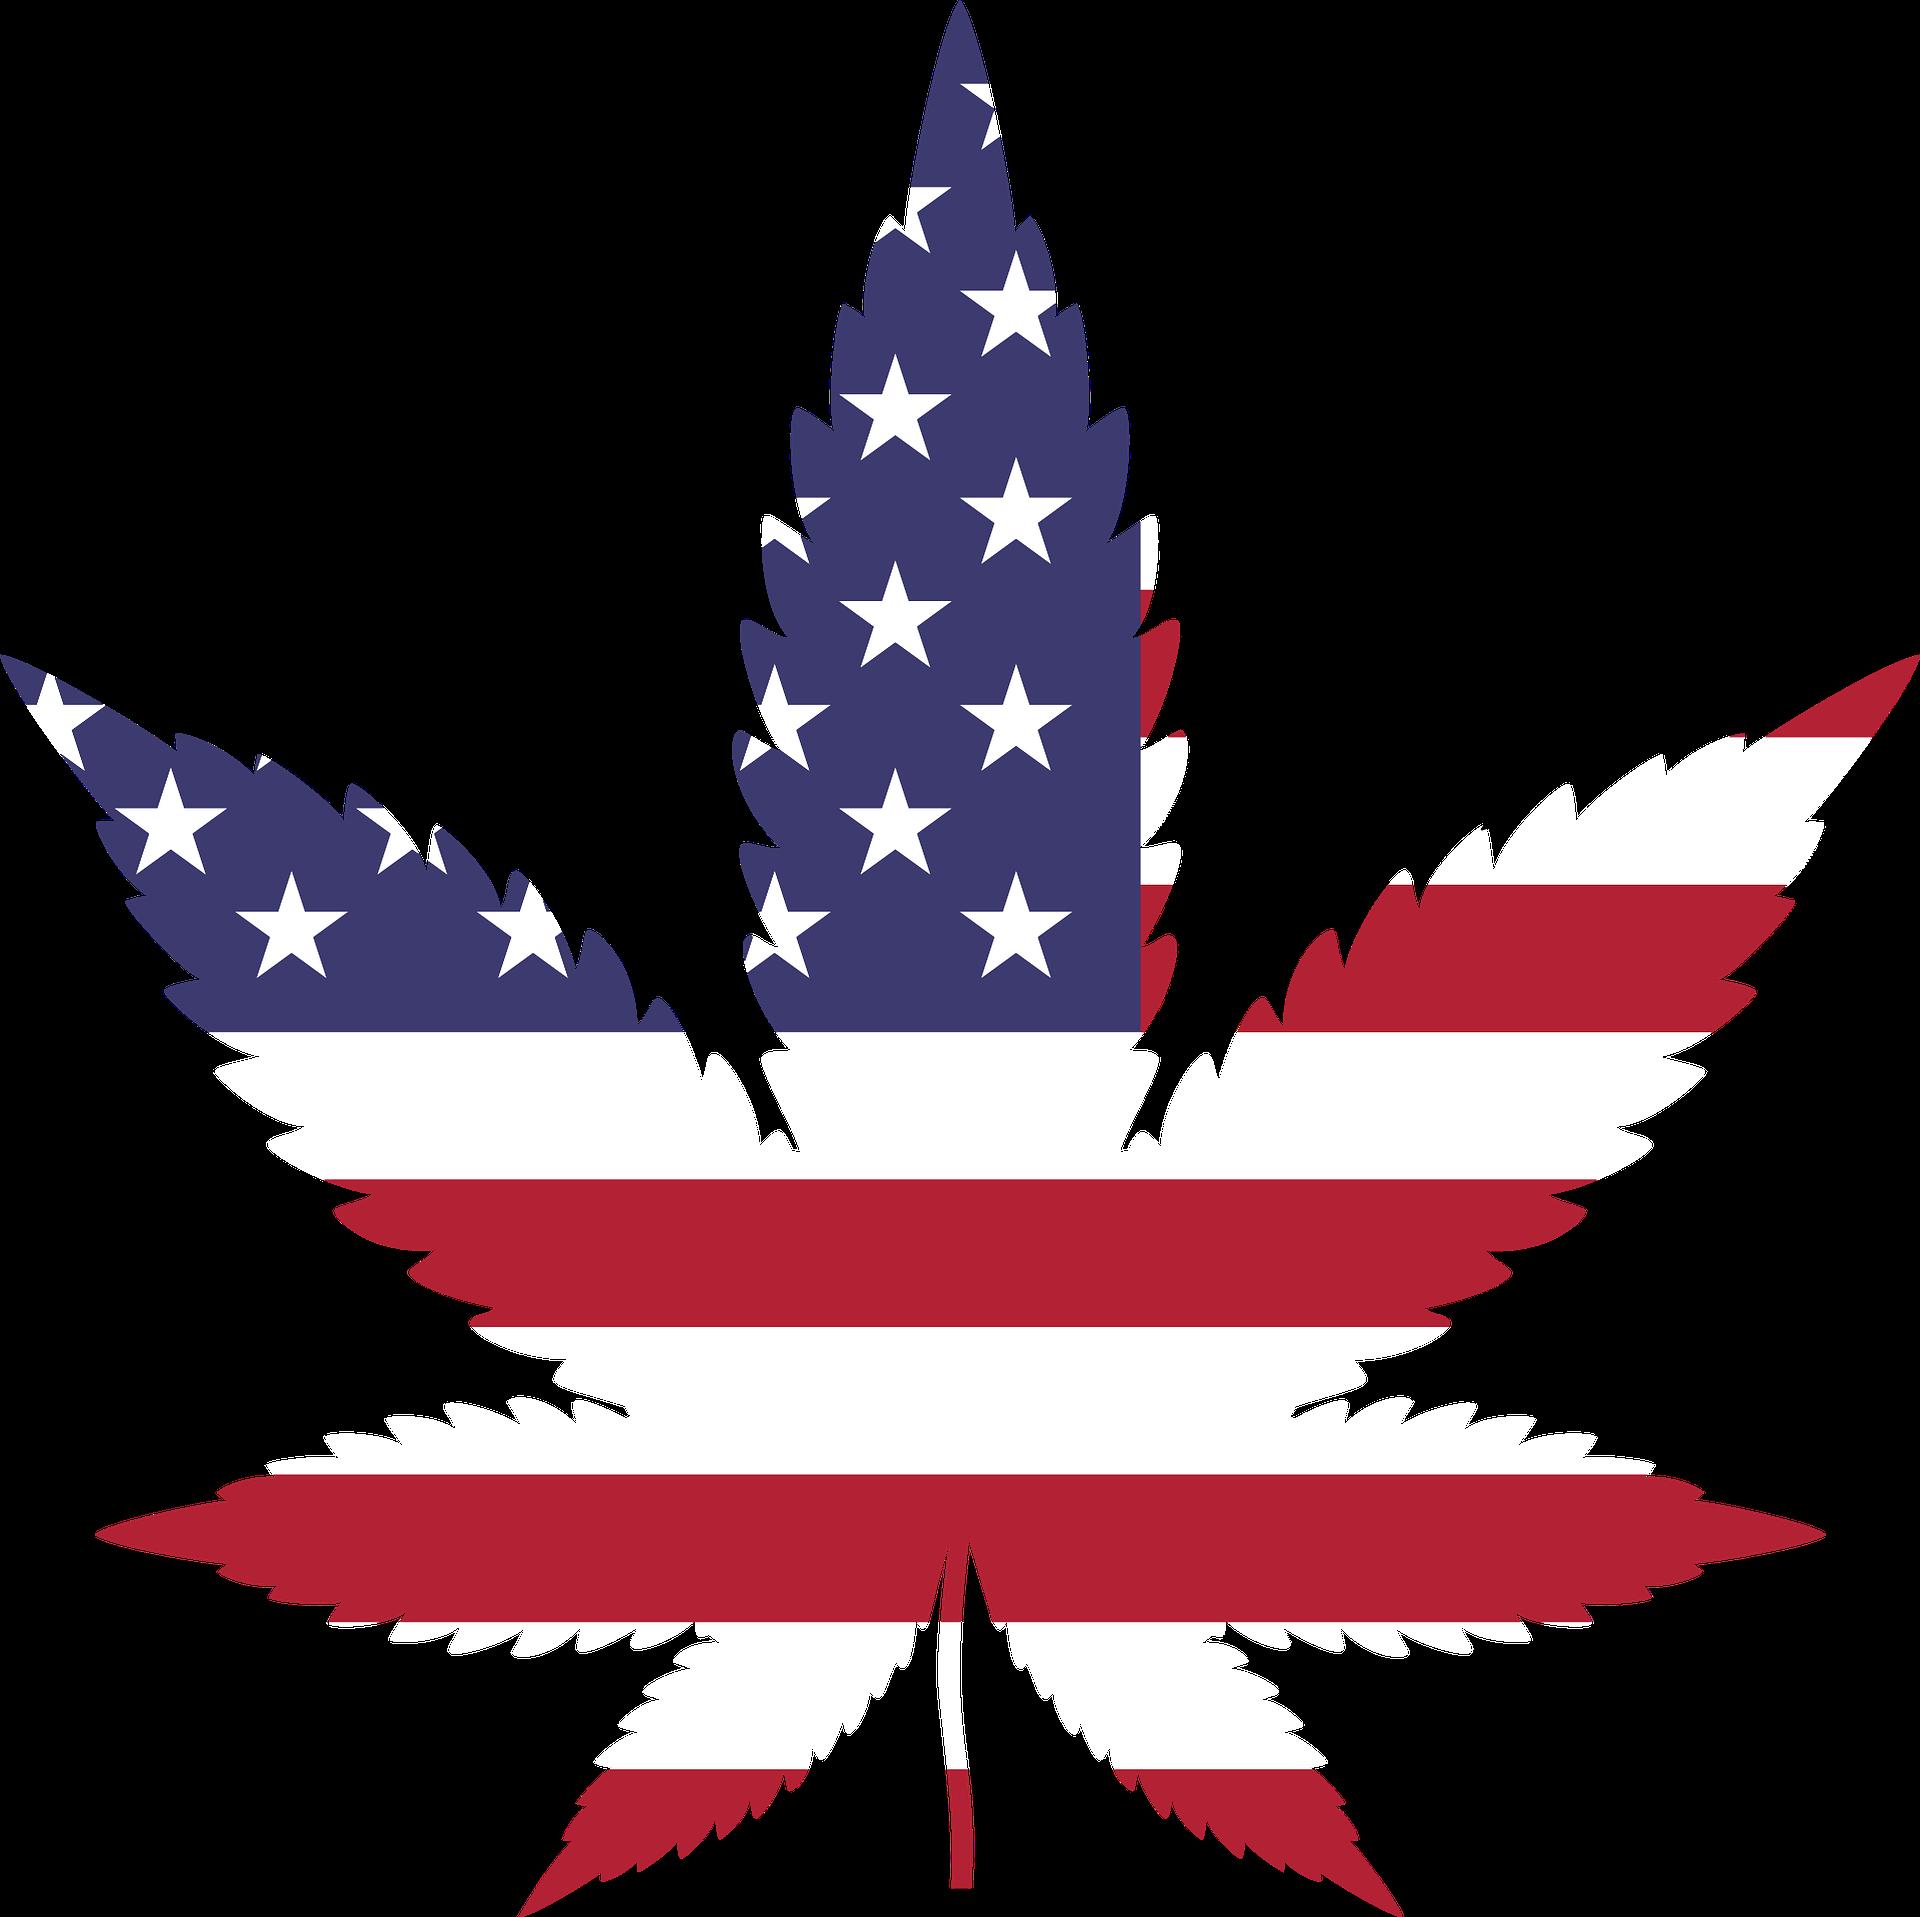 In den USA kann man seit 2014 auch legal Cannabis erwerben.